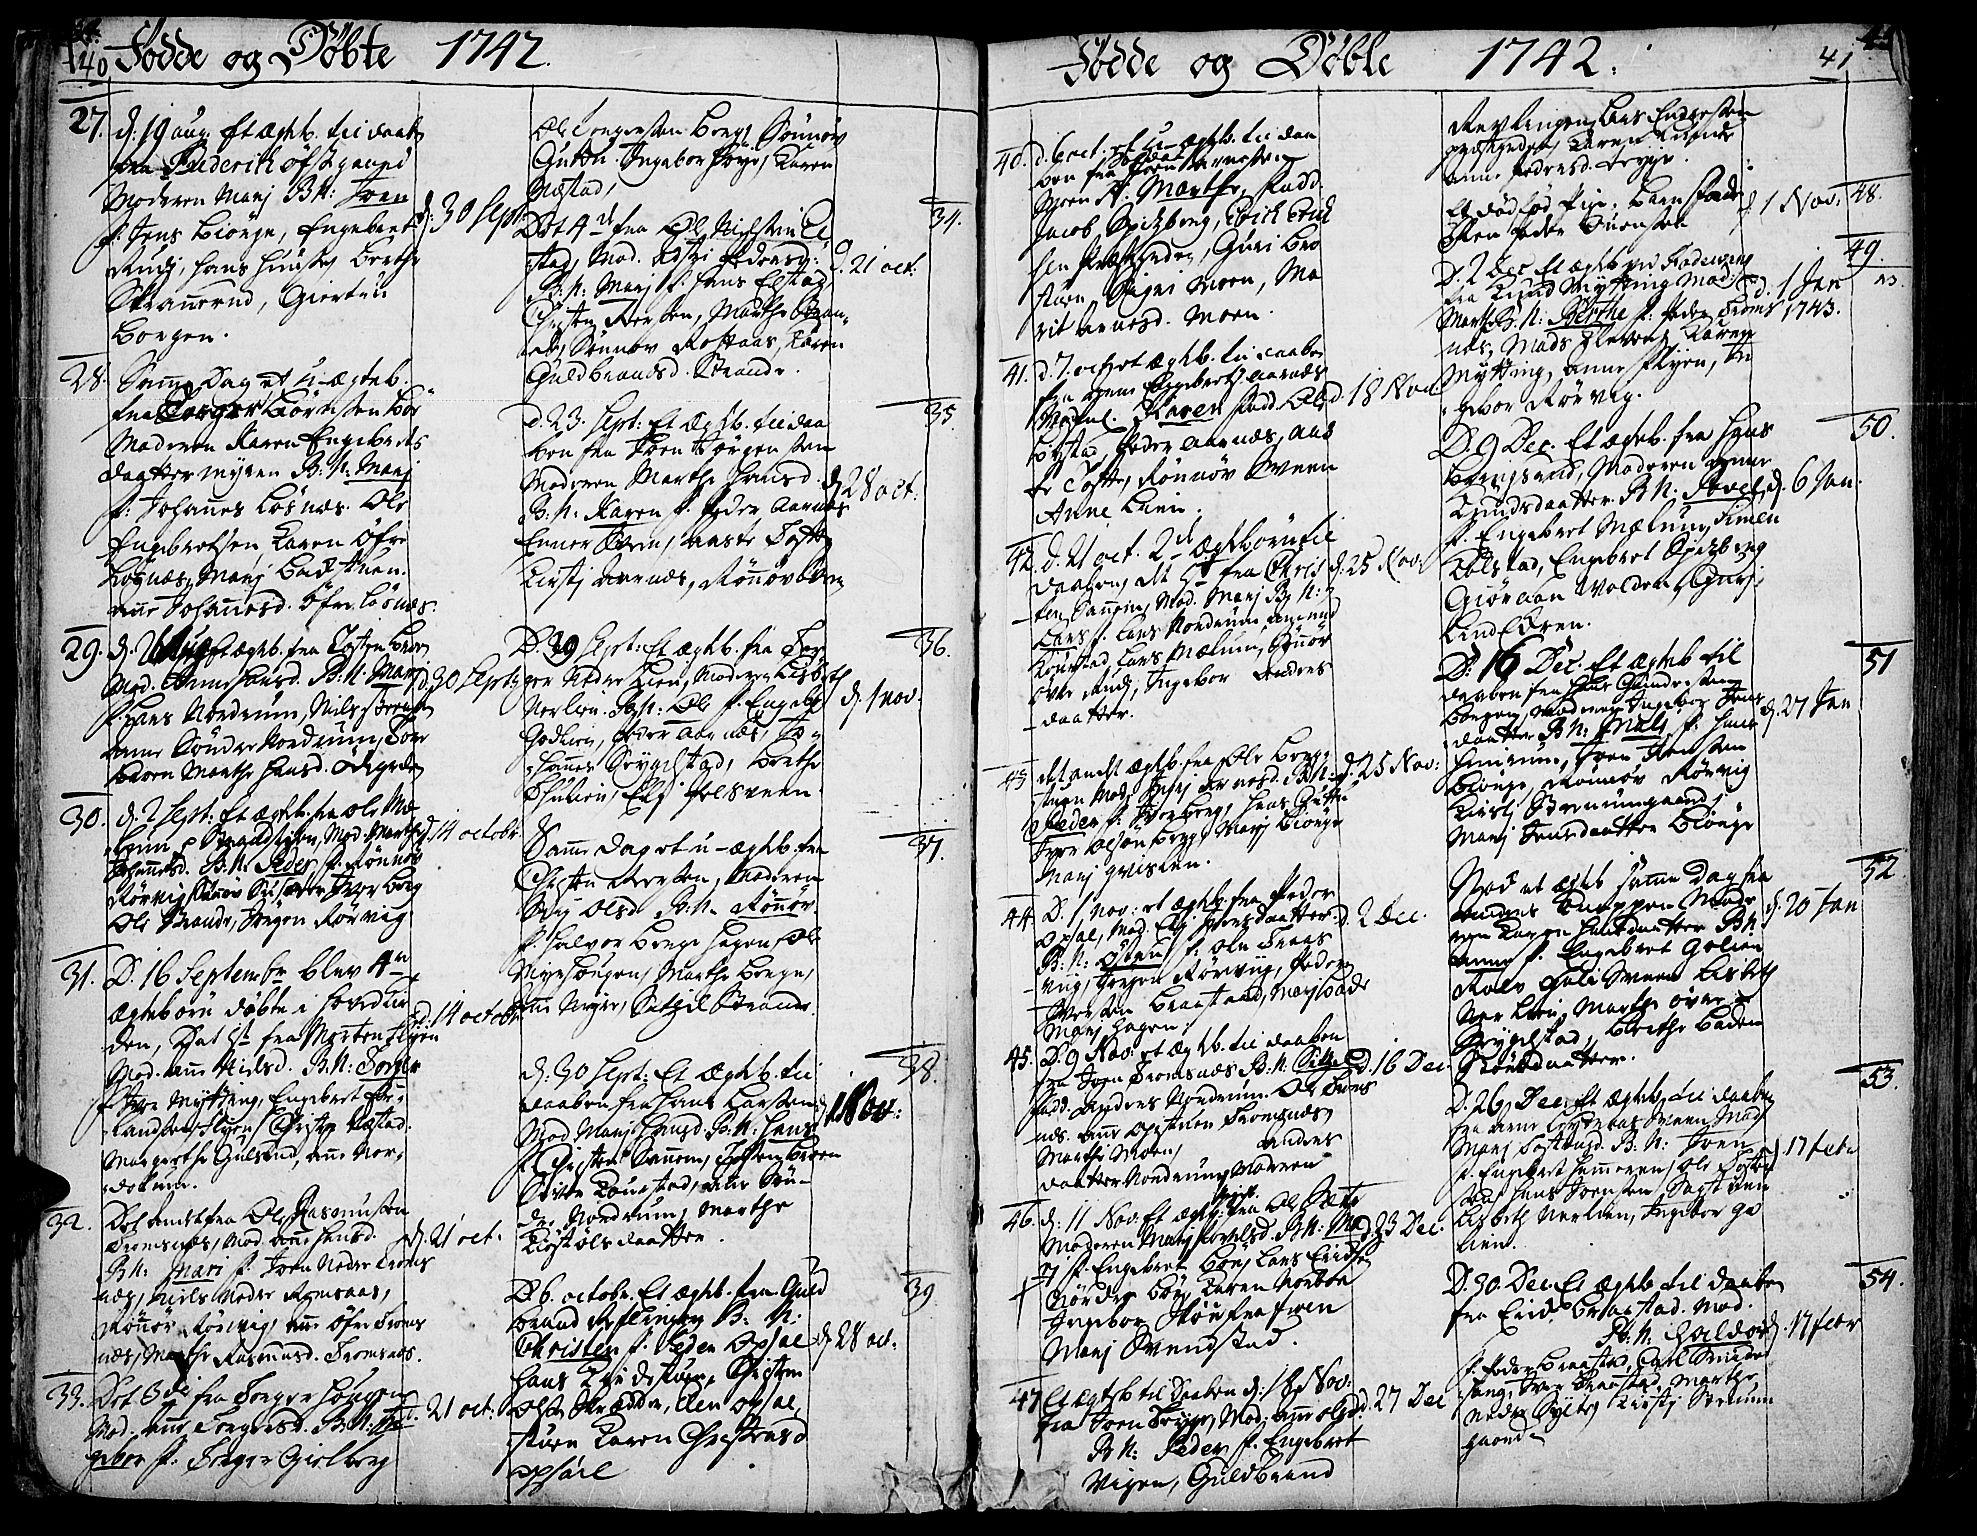 SAH, Ringebu prestekontor, Ministerialbok nr. 2, 1734-1780, s. 40-41